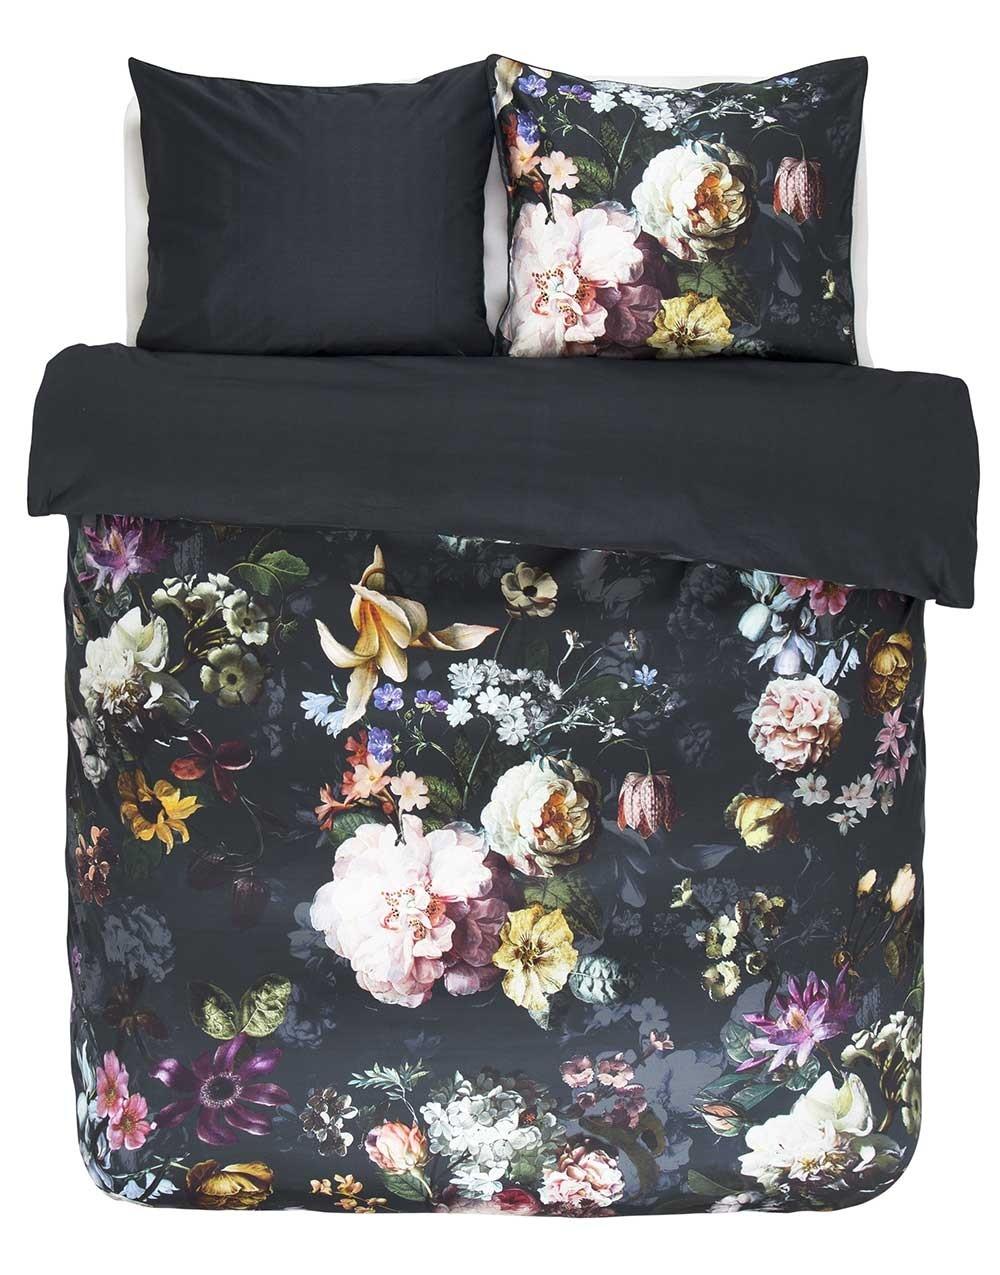 essenza sengetøj Køb Essenza Fleur Nightblue 200x200 cm sengetøj her. Fri fragt essenza sengetøj